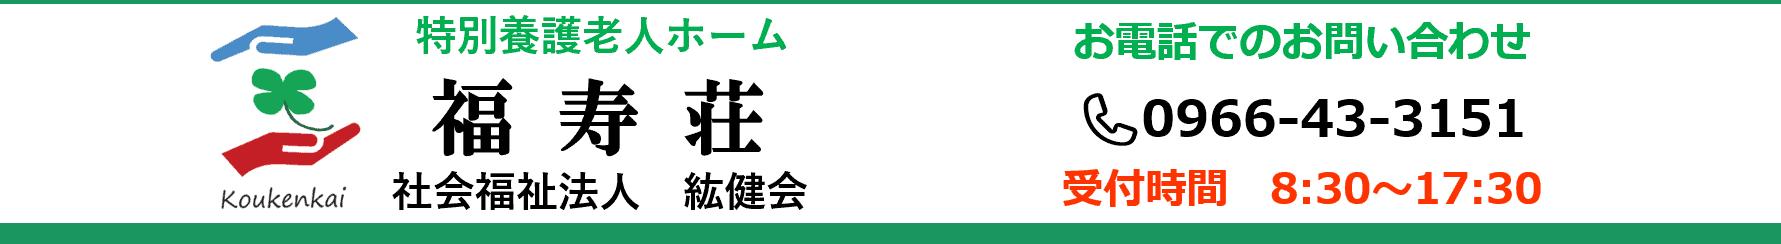 特別養護老人ホーム 福寿荘